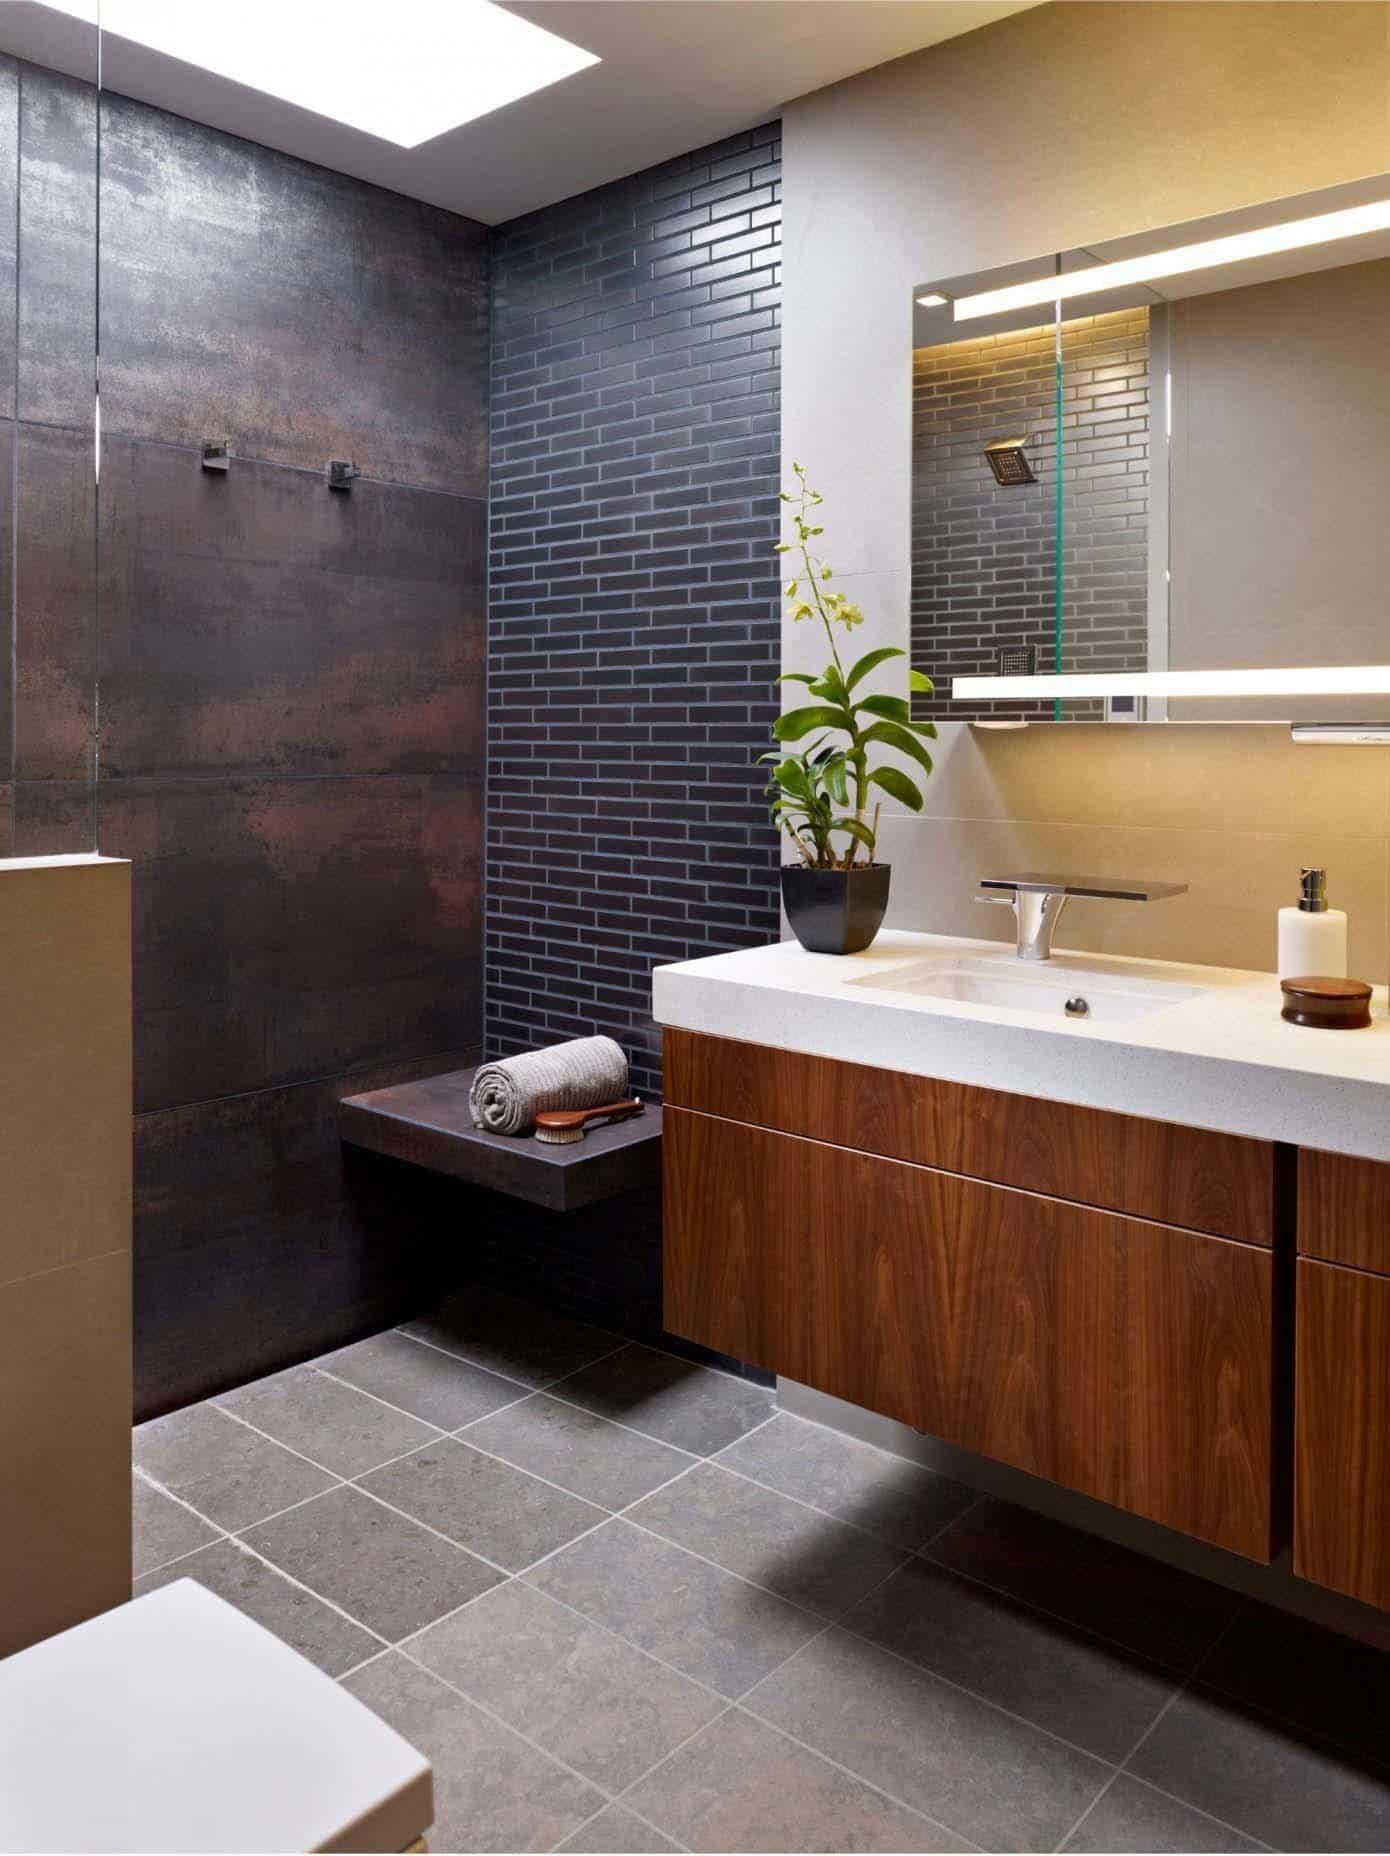 37 Amazing mid-century modern bathrooms to soak your senses on Contemporary Small Bathroom Ideas  id=69647